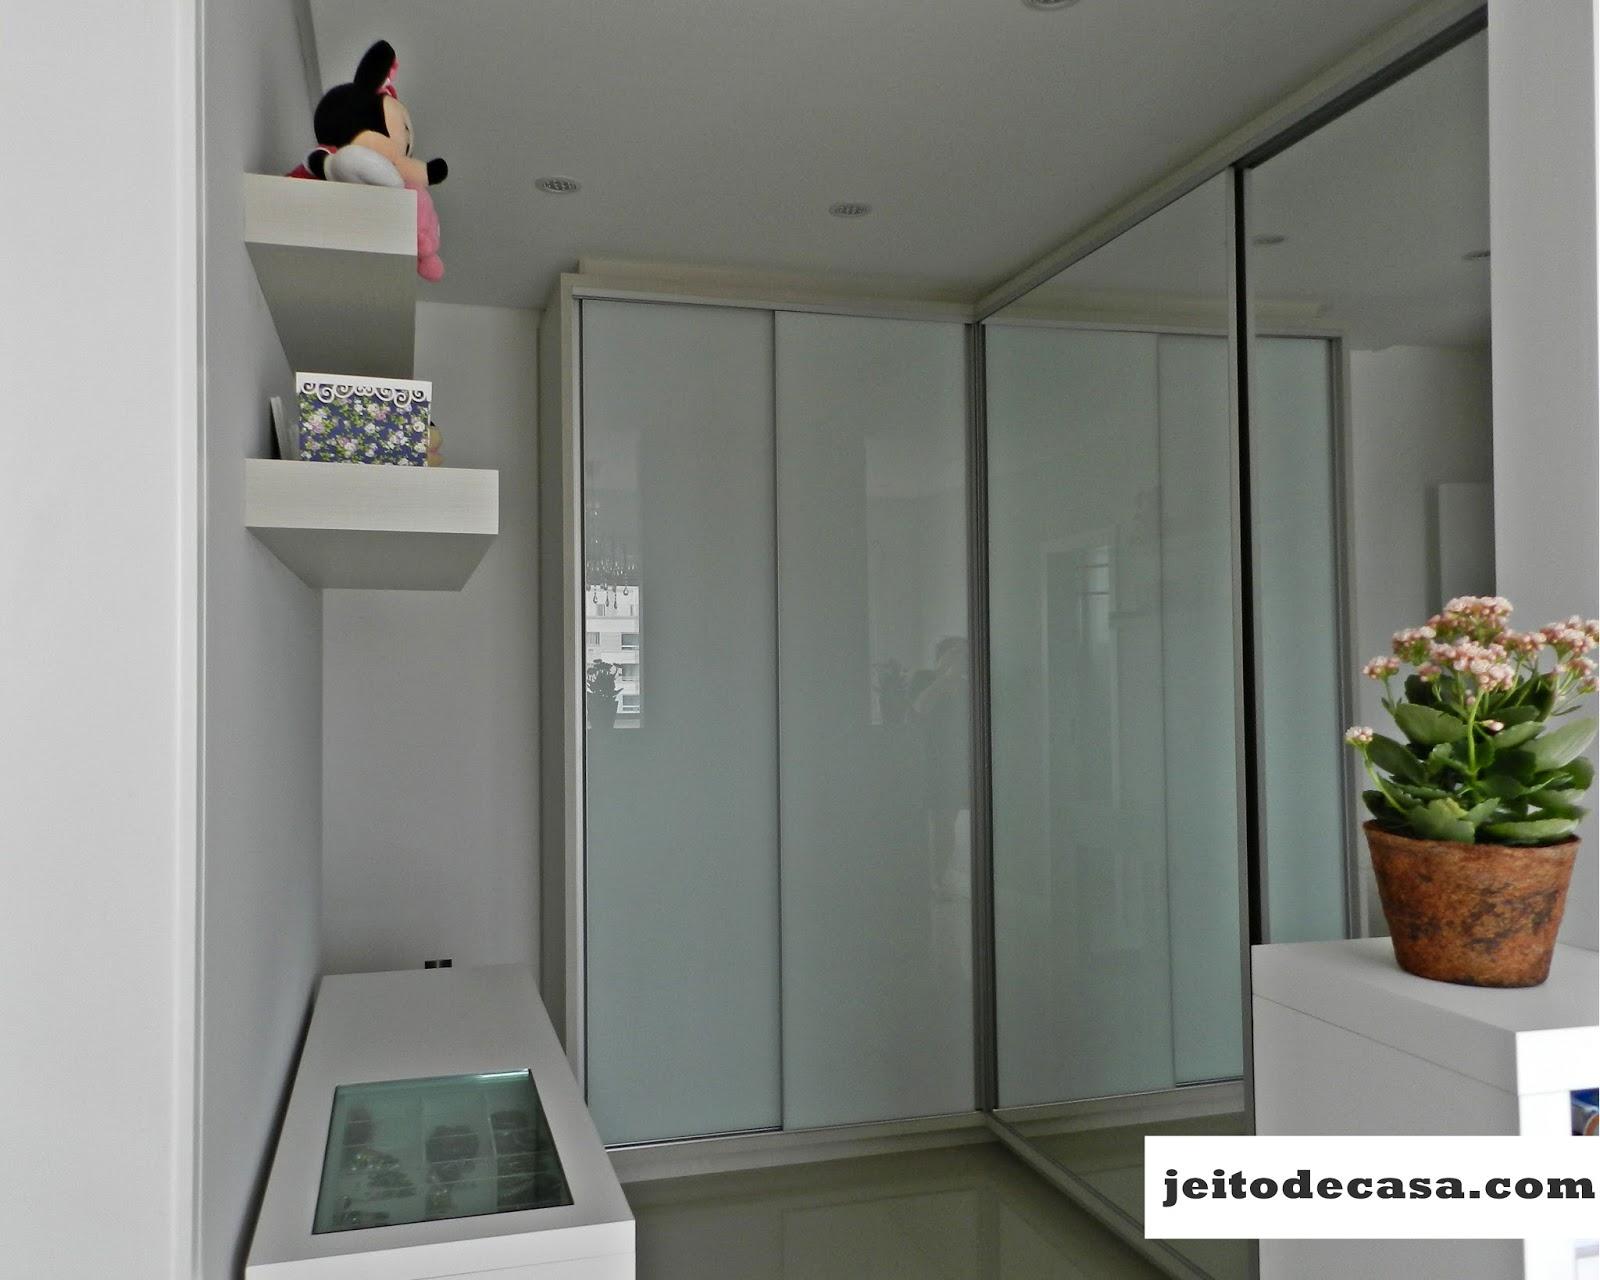 O vidro na decora o da minha casa jeito de casa for Aplicacion para disenar armarios